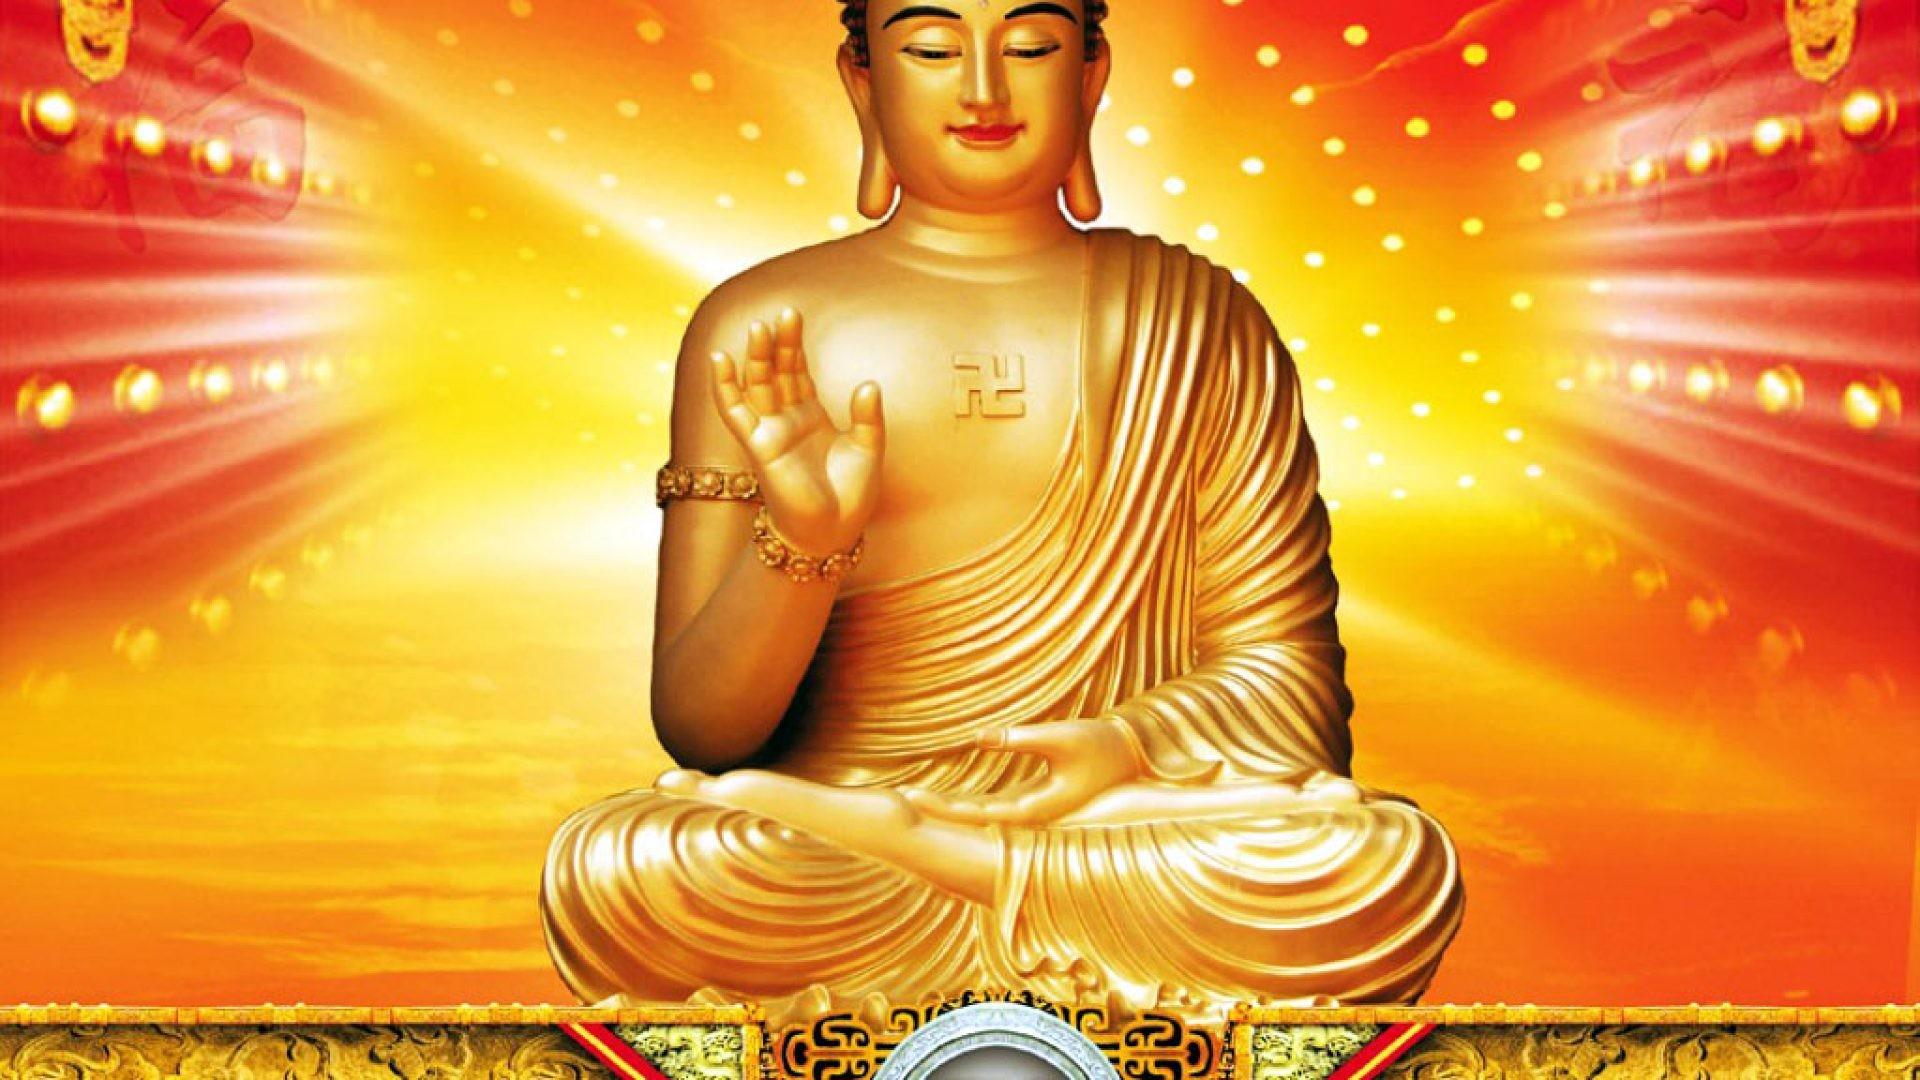 Buddha Wallpaper 1920x1080 (79+ Images